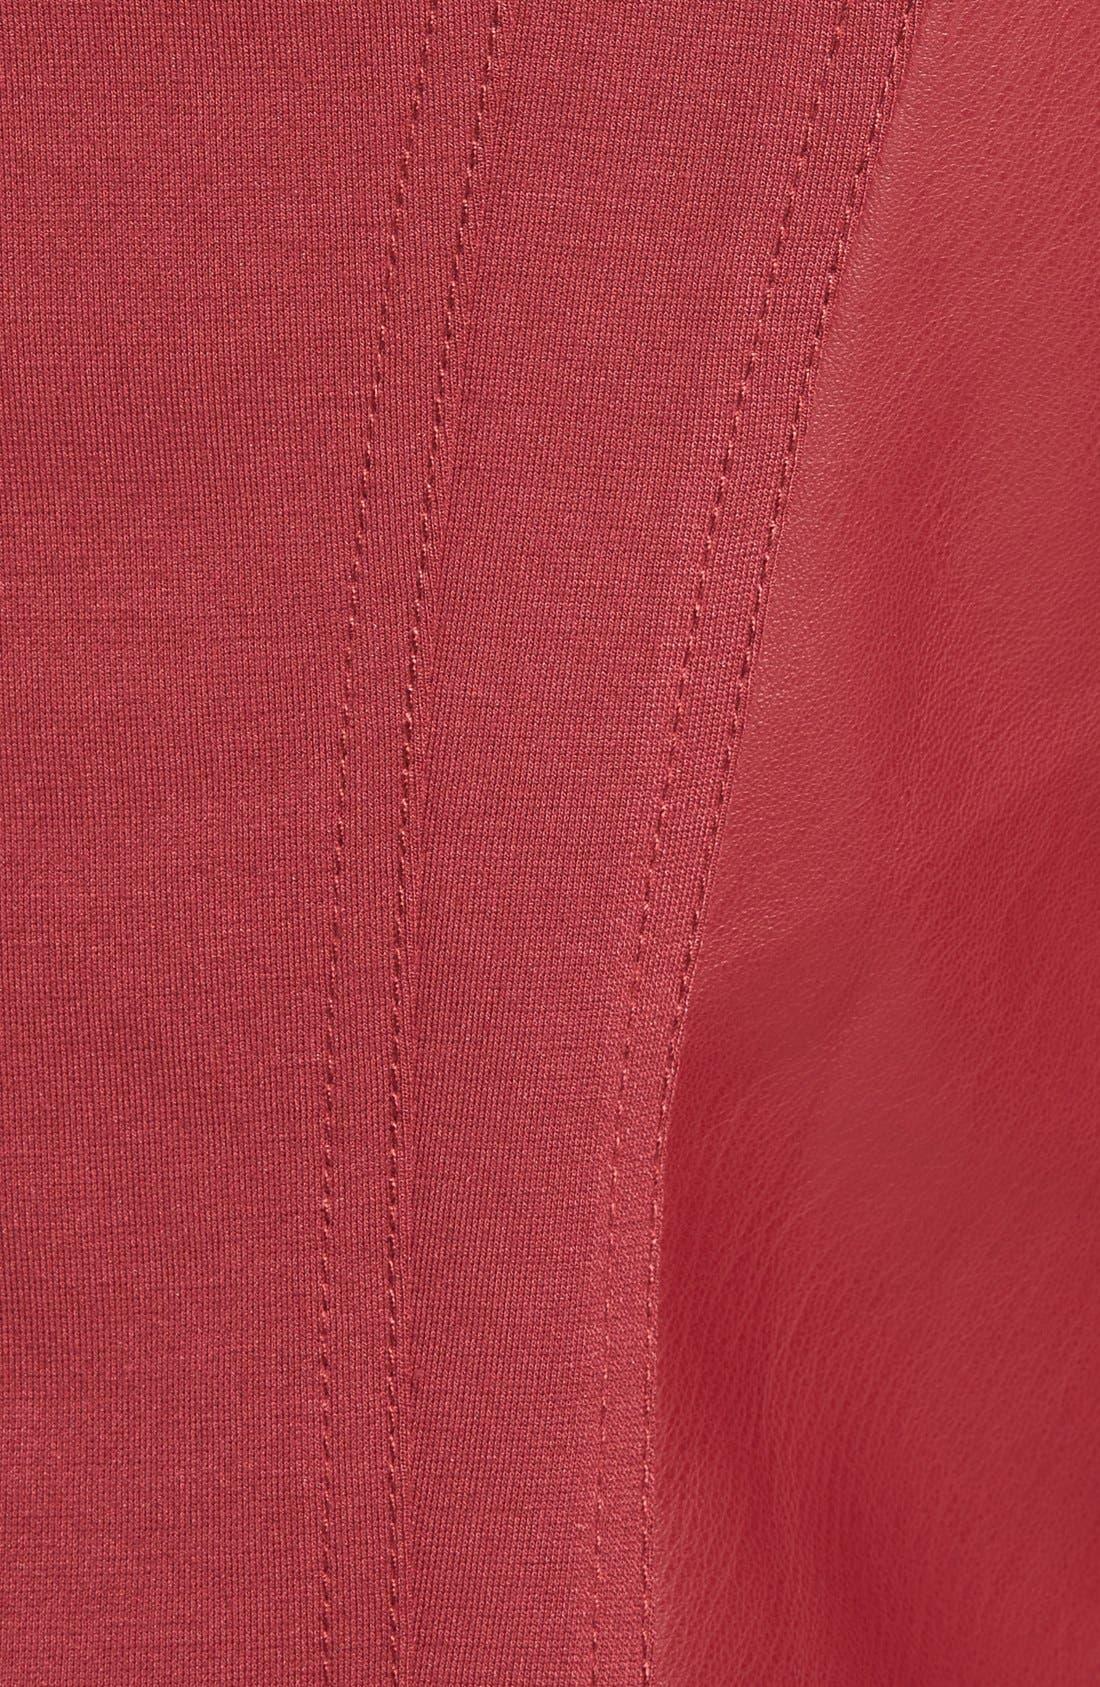 'Ana' Faux Leather Drape Front Jacket,                             Alternate thumbnail 15, color,